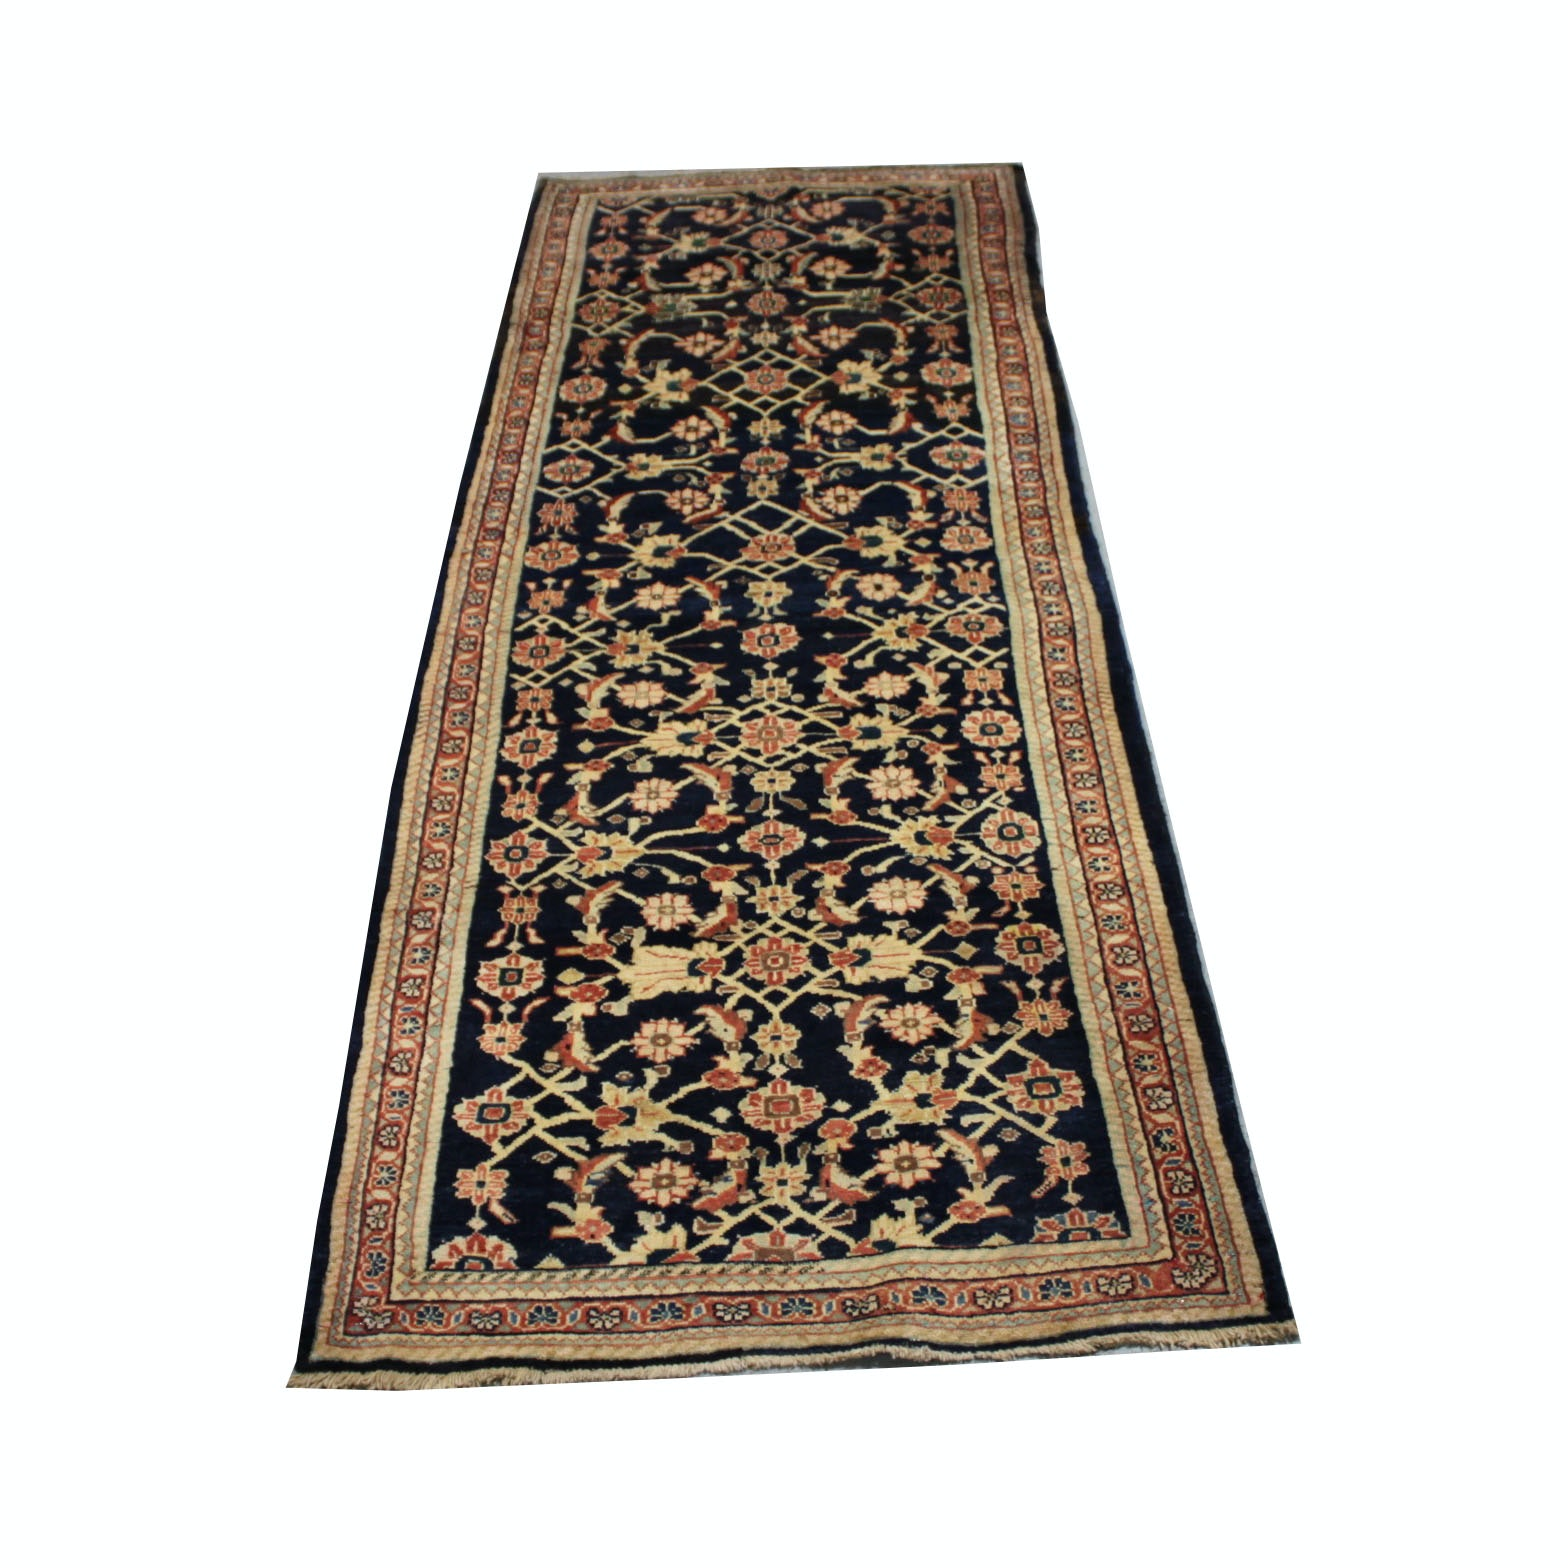 Vintage Hand-Knotted Persian Lilihan Carpet Runner